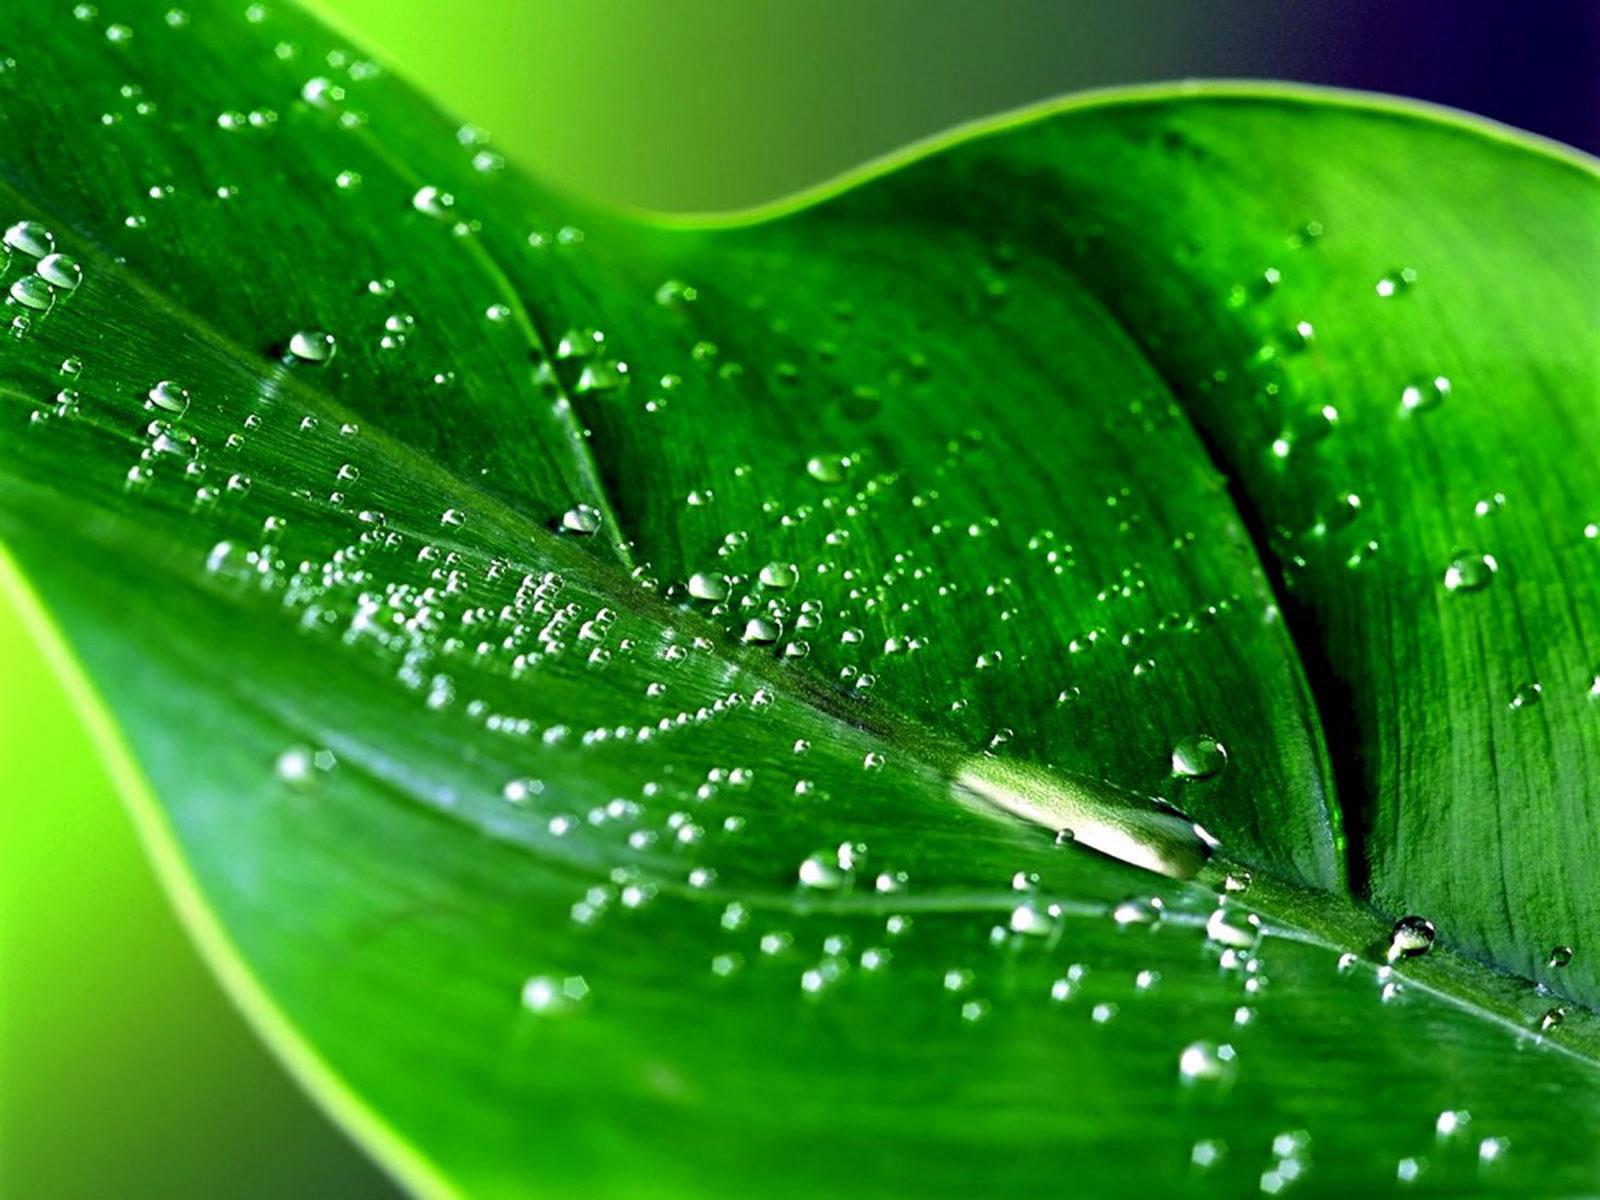 http://4.bp.blogspot.com/_DEB1t8q_om0/SwycPEIBgjI/AAAAAAAACh0/Cz4XSili5oE/s1600/Hd-desktop-wallpaper-background-green-photography-HQ-image-1600x1200.jpg.jpg